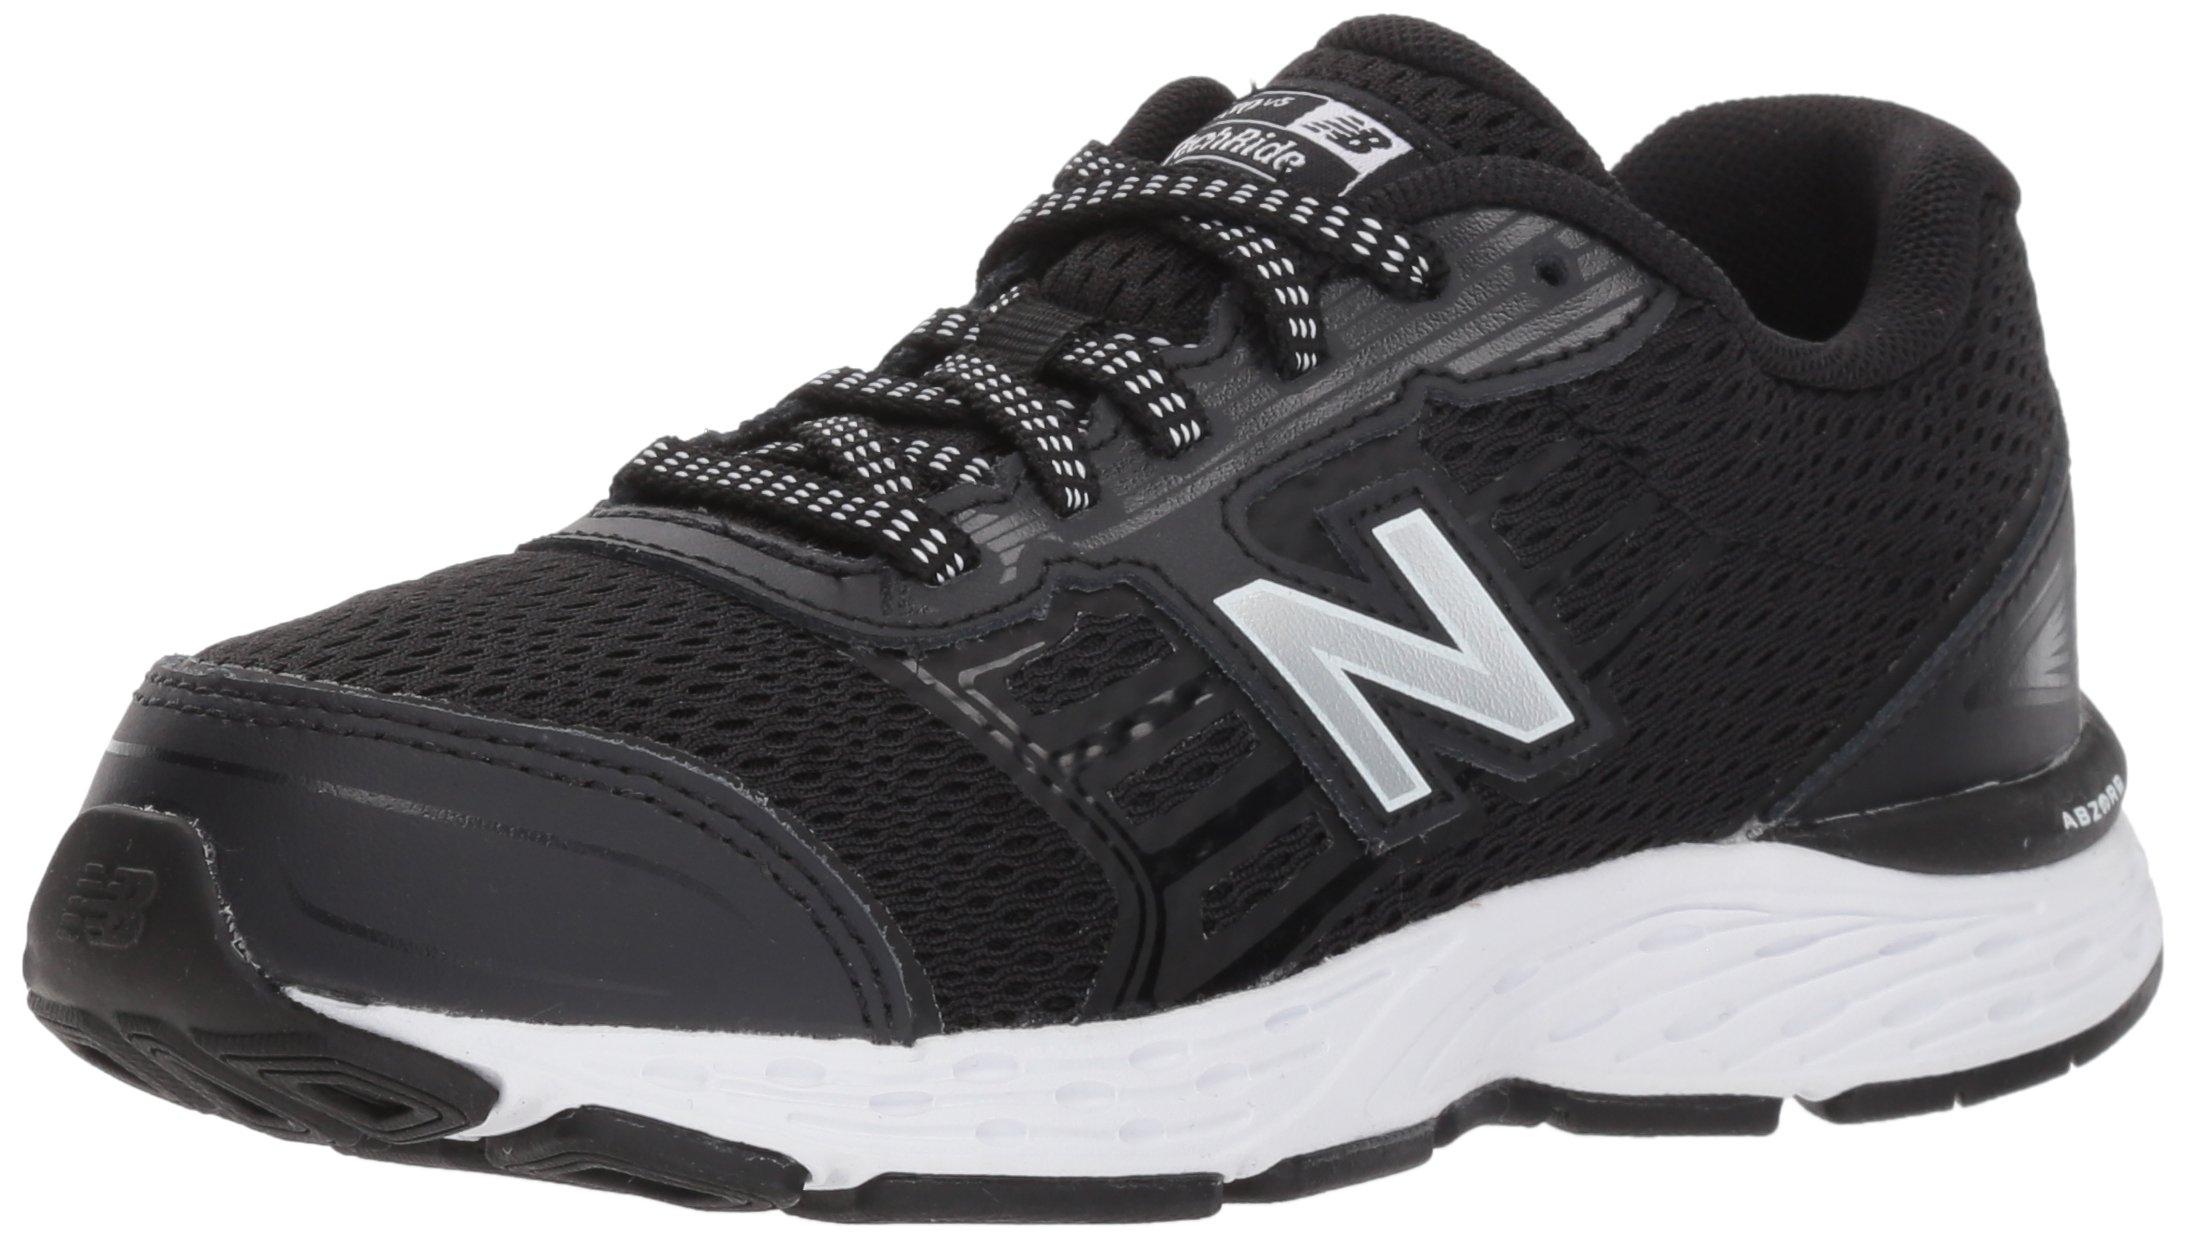 New Balance Boys' 680v5 Running Shoe, Black/White, 4 M US Big Kid